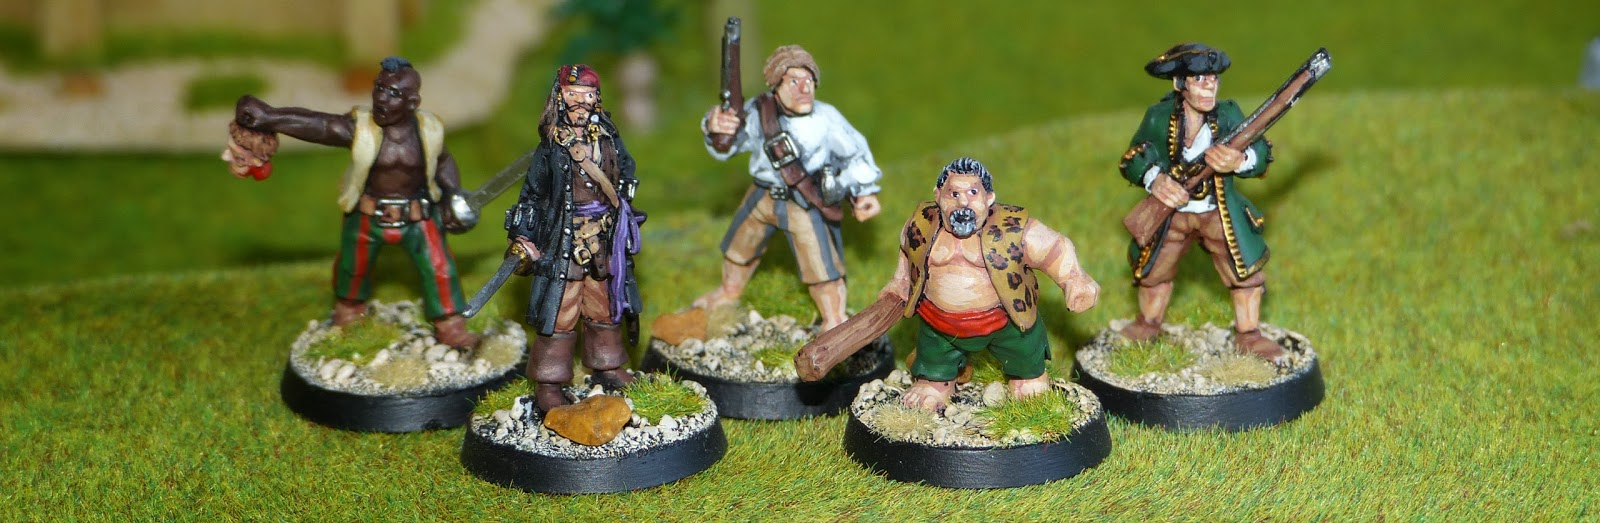 Mes Pirates Team-Capitaine-Jack-Sparrow